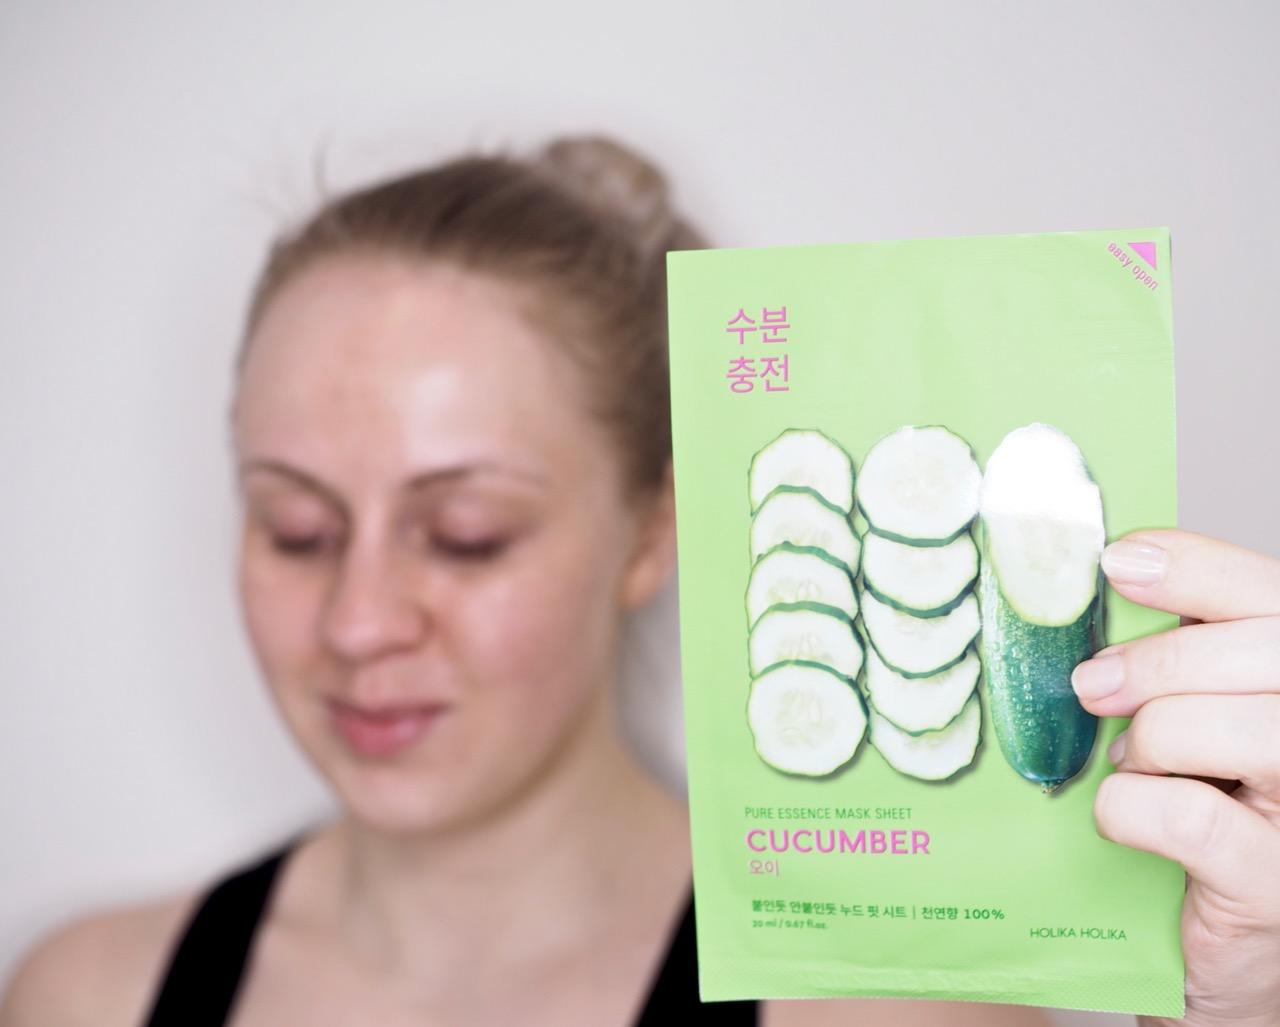 Holika Holika Pure Essence Mask Sheet Cucumber kangasnaamio kokemuksia Ostolakossa Virve Vee